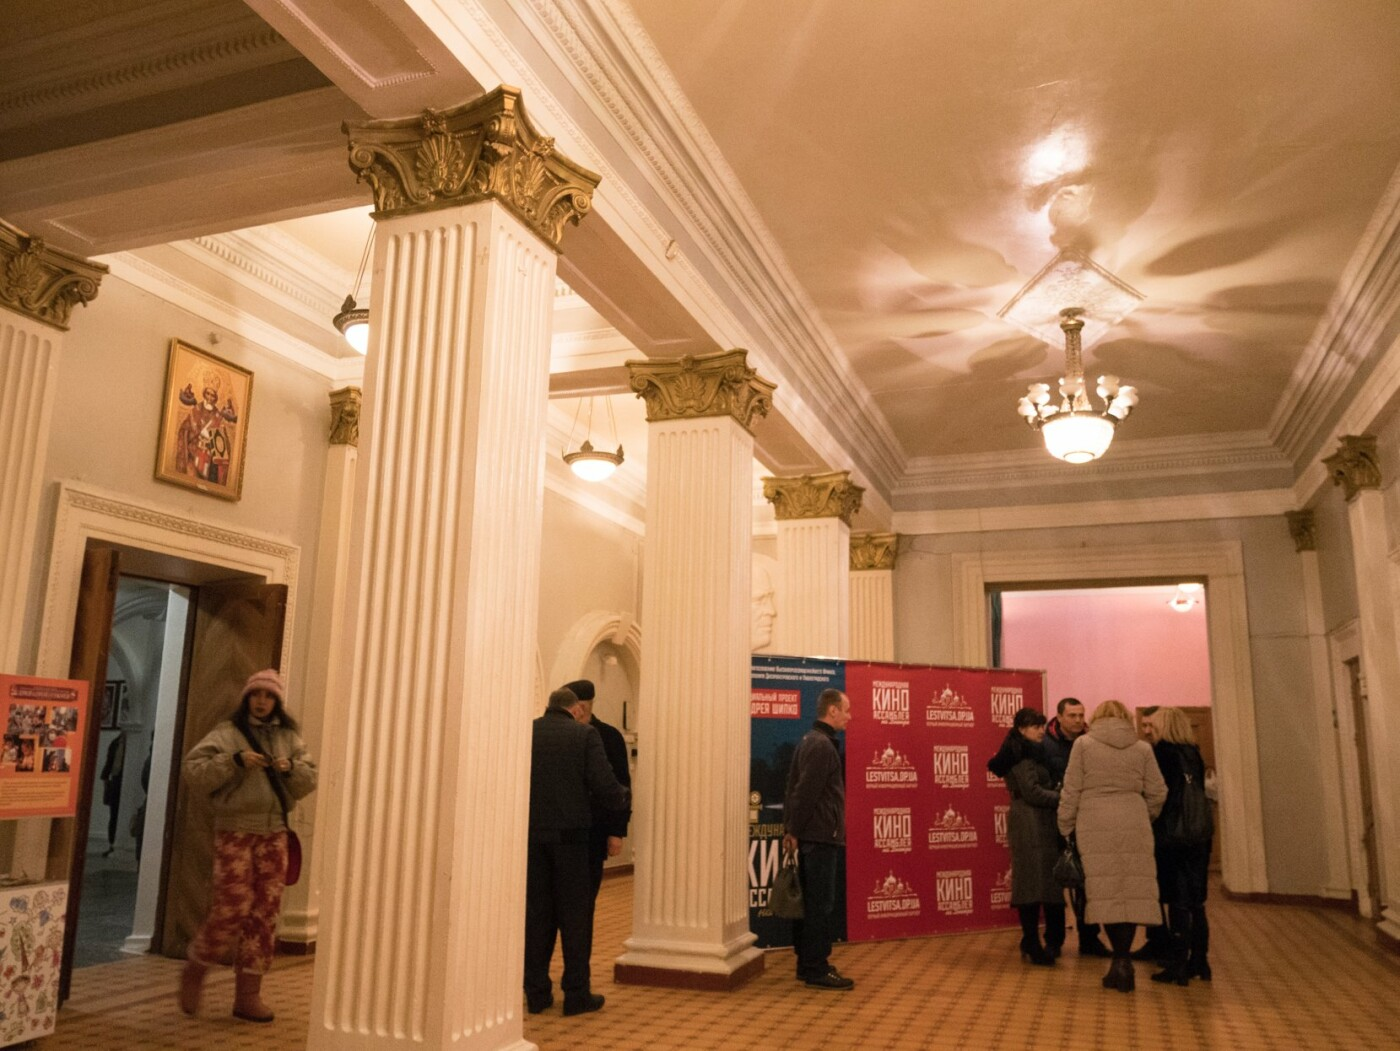 Киноассамблея на Днепре-2018: как прошла церемония открытия кинофорума (ФОТО), фото-12